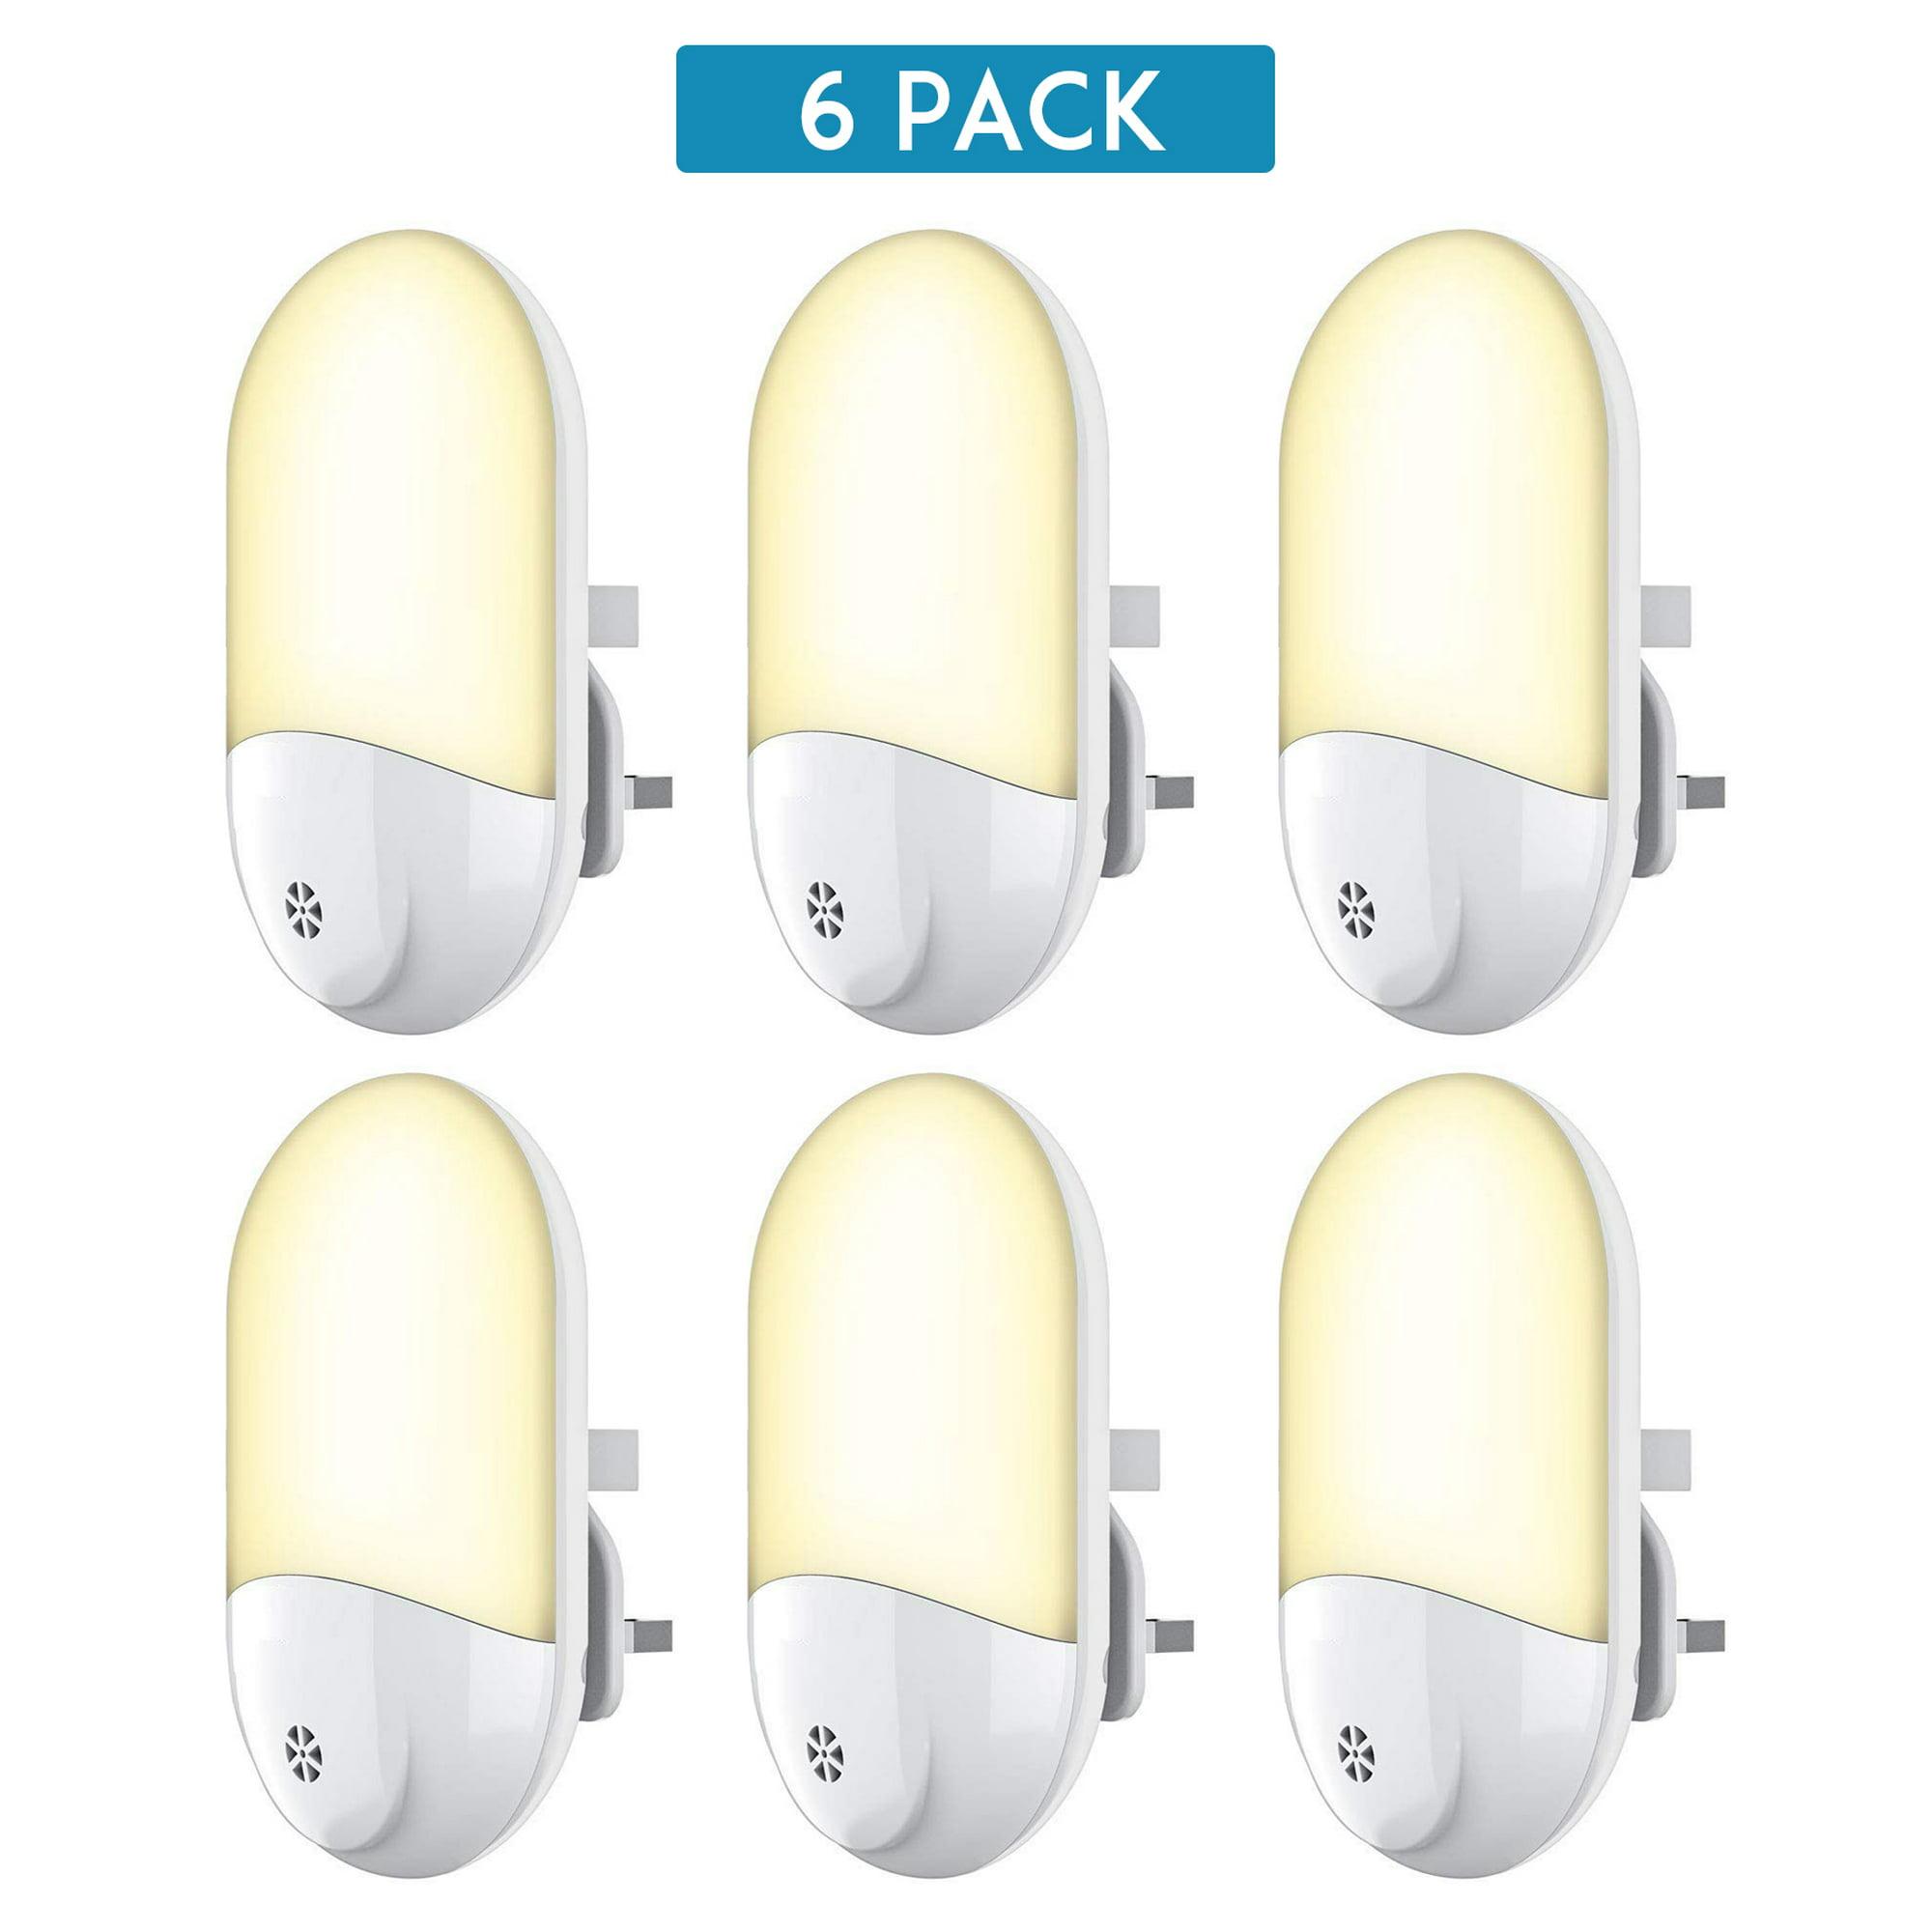 Warm White Energy Efficient Kids Lighting Plug In Night Lights Smart Induction Small Light Nightlight For Hallway Bathroom